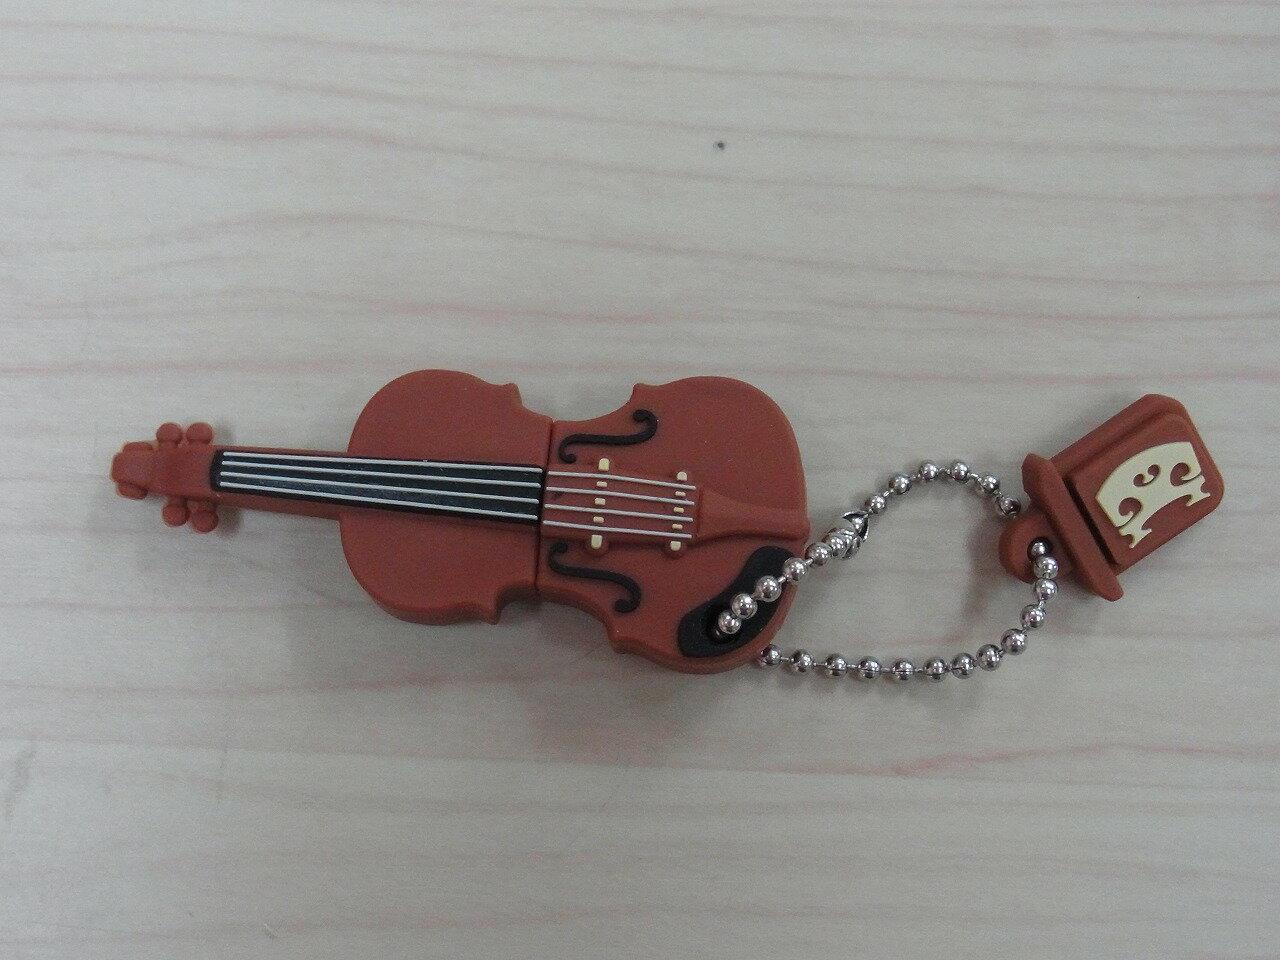 USBメモリ♪バイオリン 2GB♪この商品はお取り寄せ商品です♪♪【楽器-音楽雑貨】《音楽・バレエ・ねこ雑貨のカンタービレ》スタンド ケース付き 音楽雑貨 楽器 発表会 記念品 プレゼント ギフト にも♪グランドピアノ ピアノ 鍵盤楽器